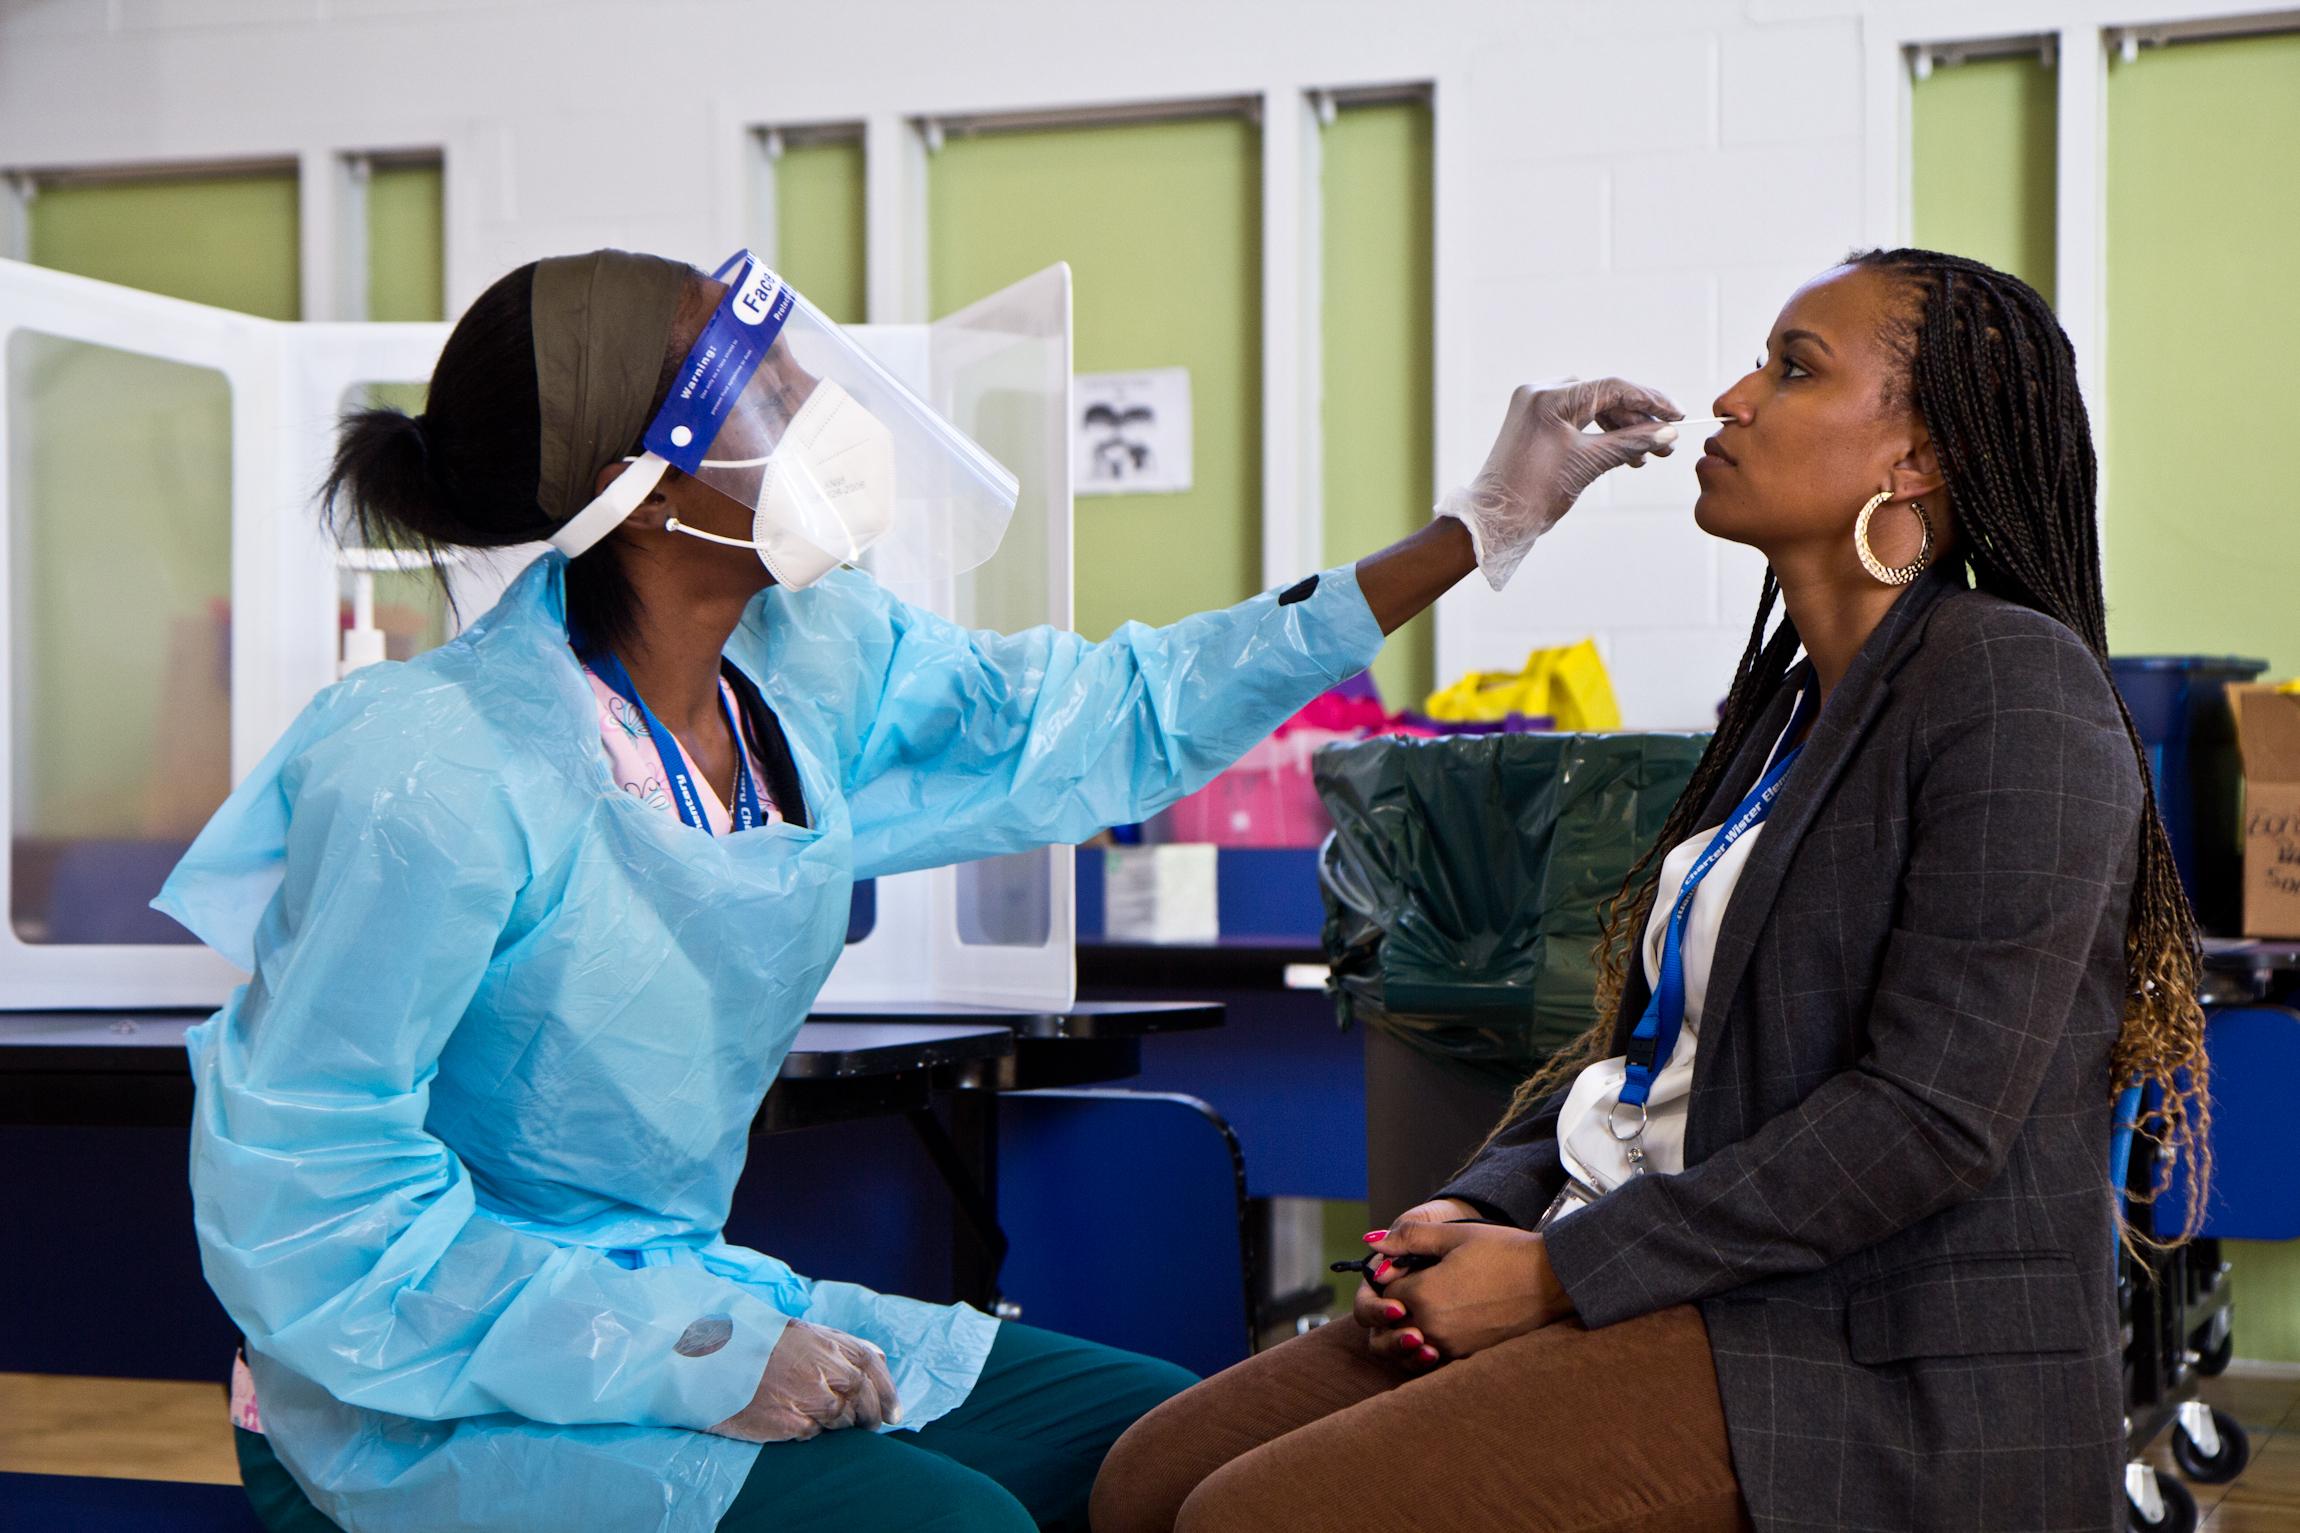 Nurse Paris tests Principal Langston for COVID-19 in the gymnasium